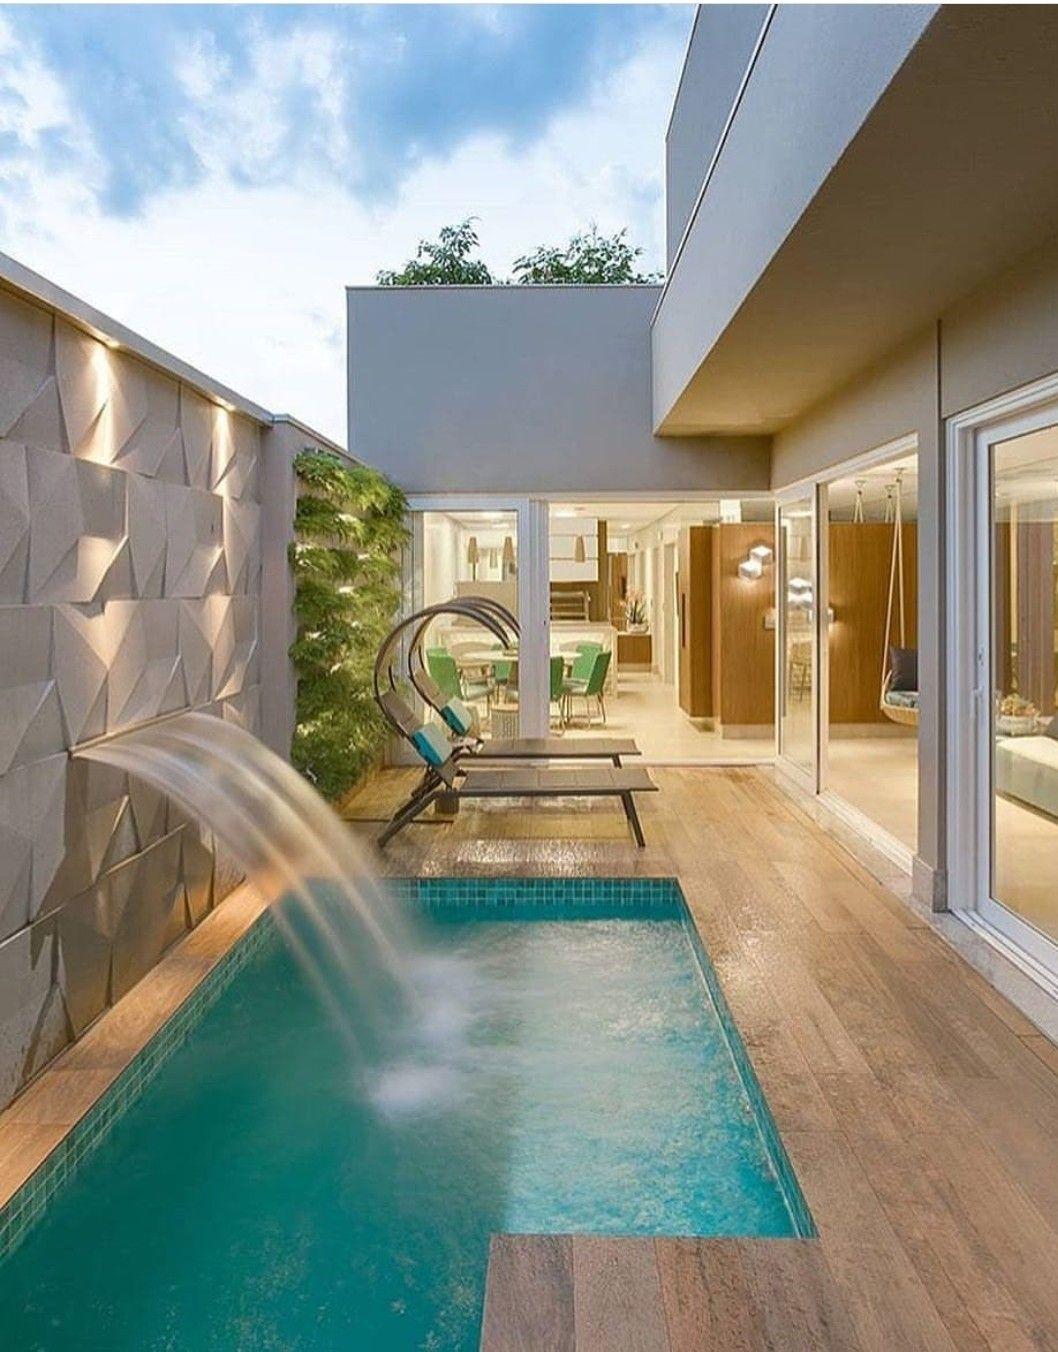 حمام سباحه | Pool in 2019 | Pool houses, House, Pool designs